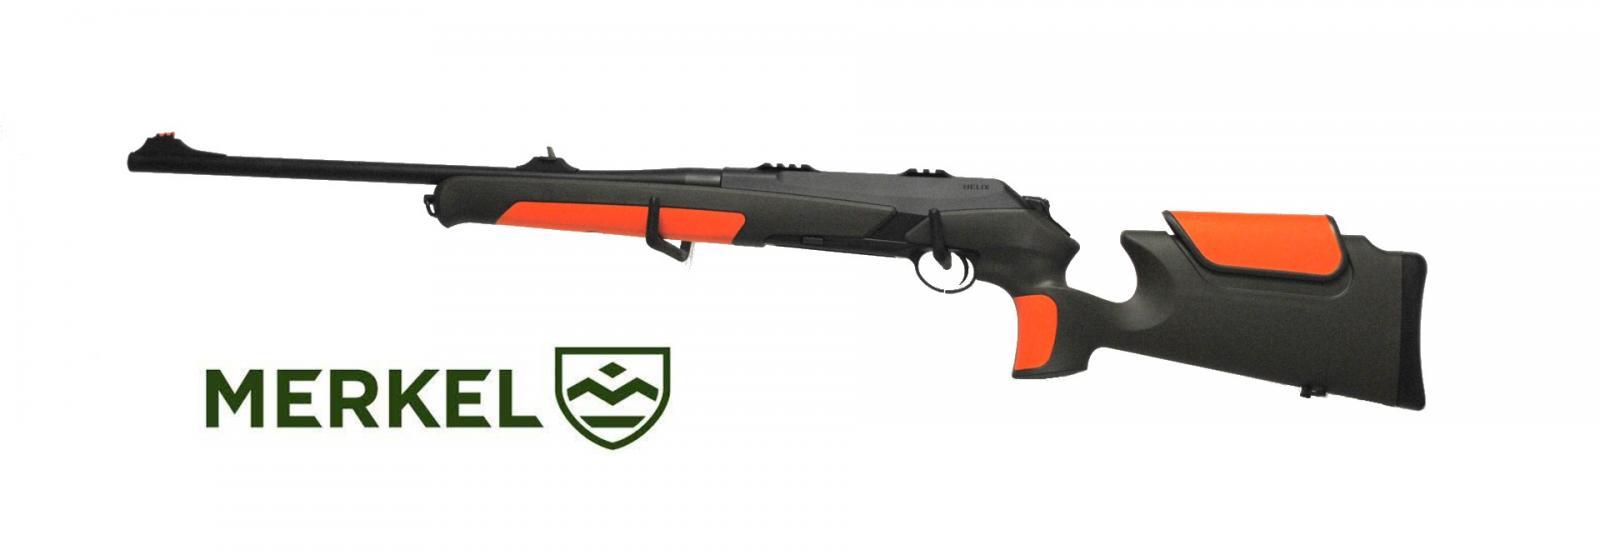 Carabine MERKEL RX HÉLIX SPEEDSTER verte/orange Cal 30-06